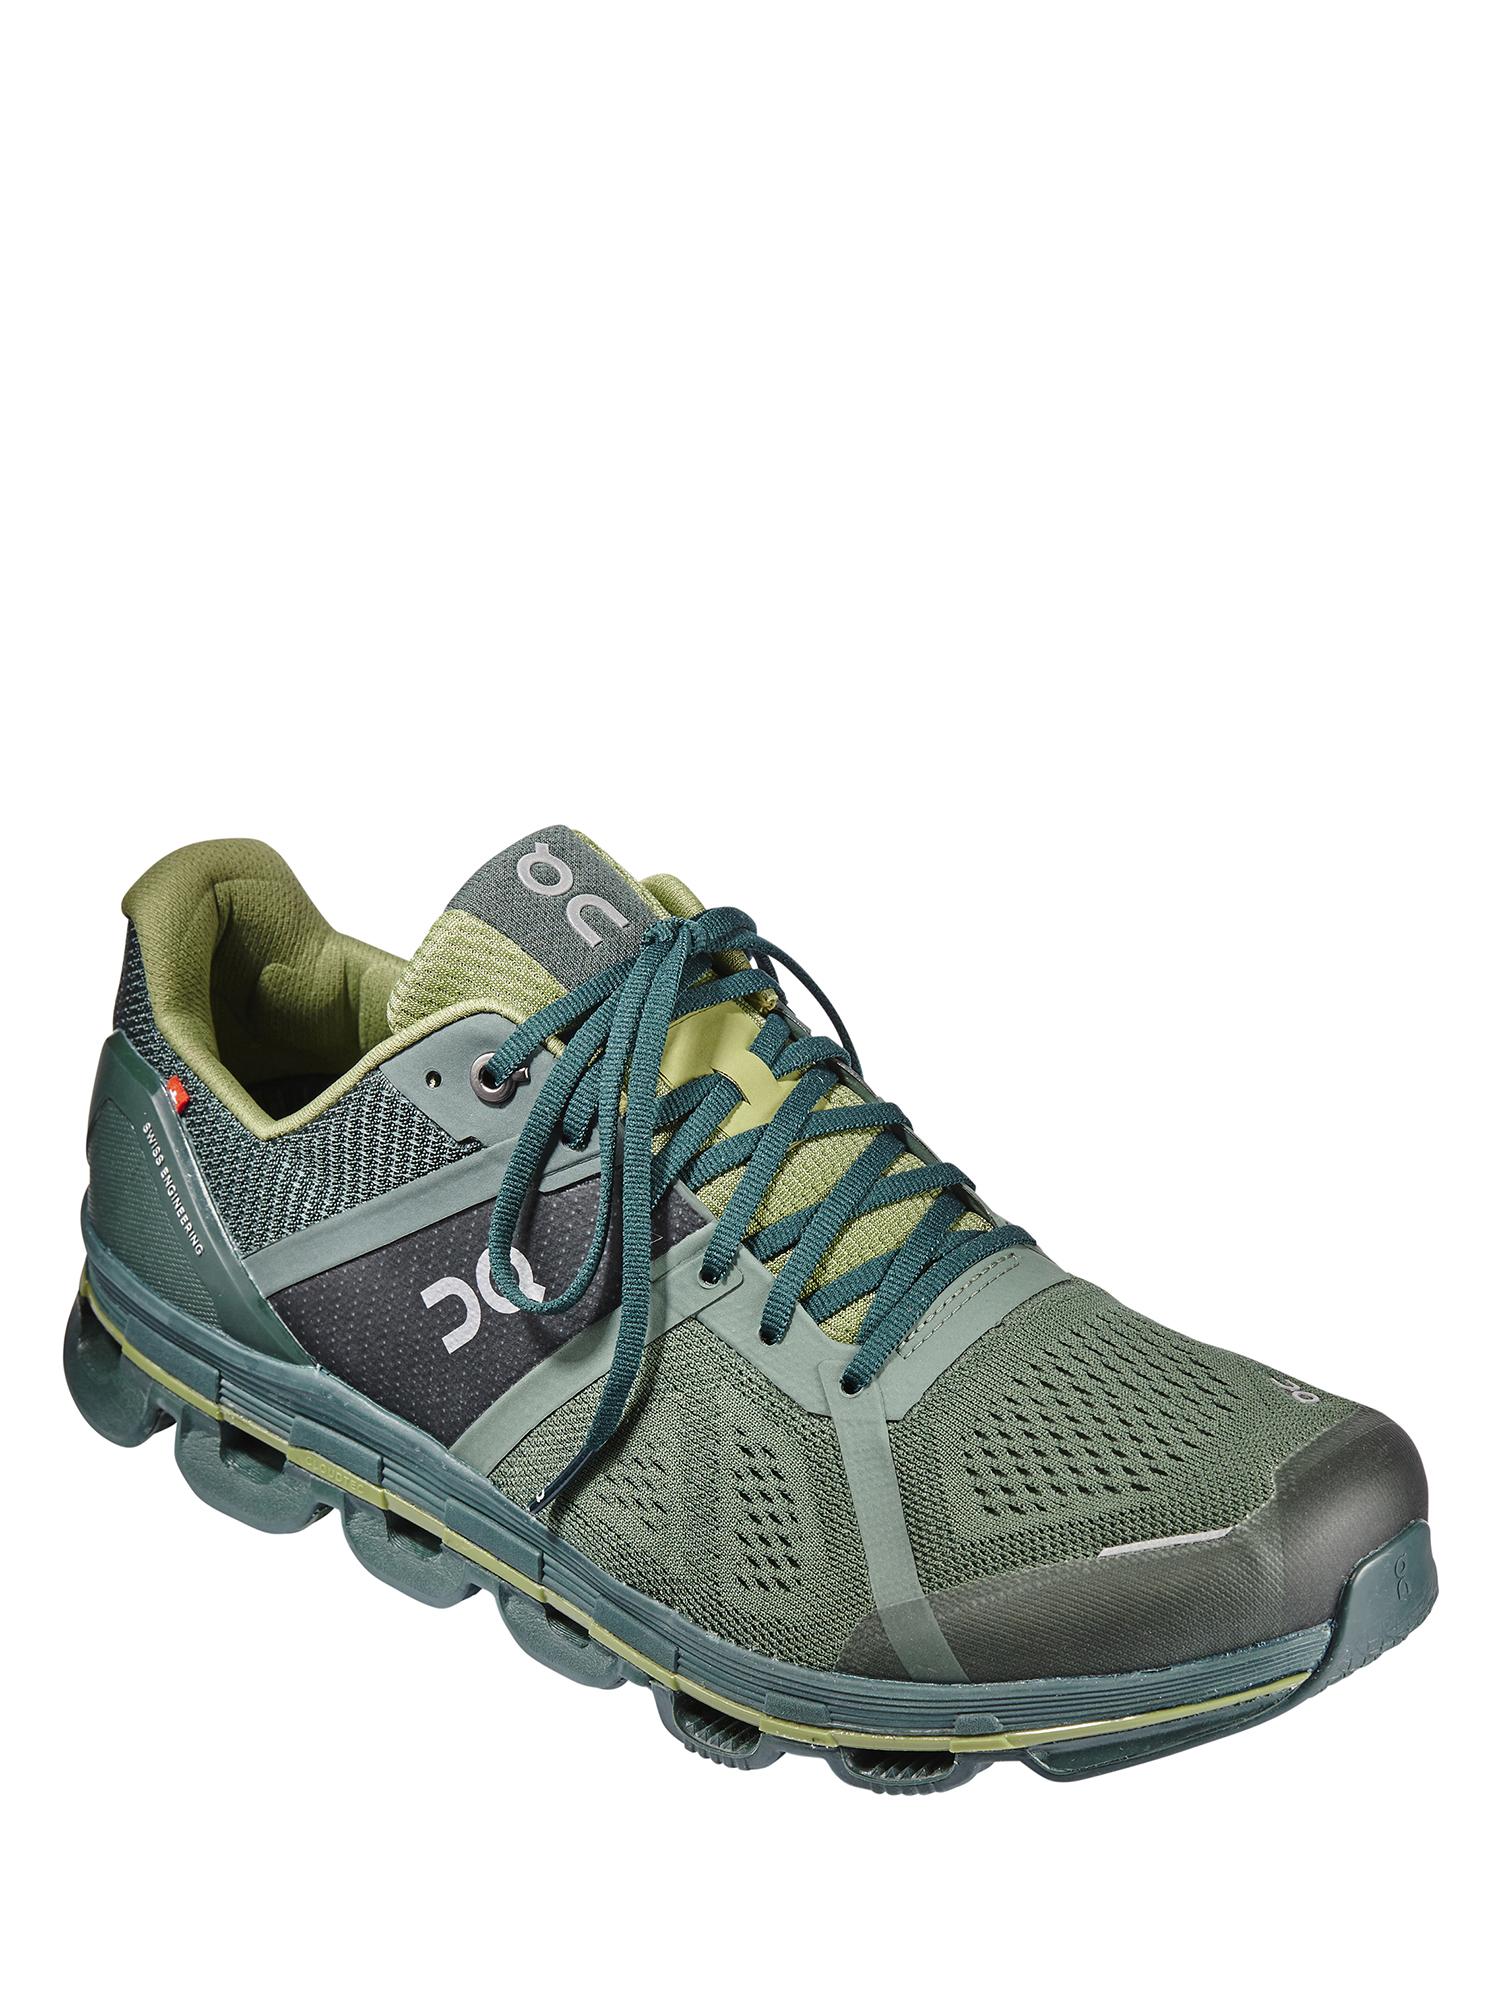 c33c179e6 cloudace ivy/sage running shoe - Gorsuch